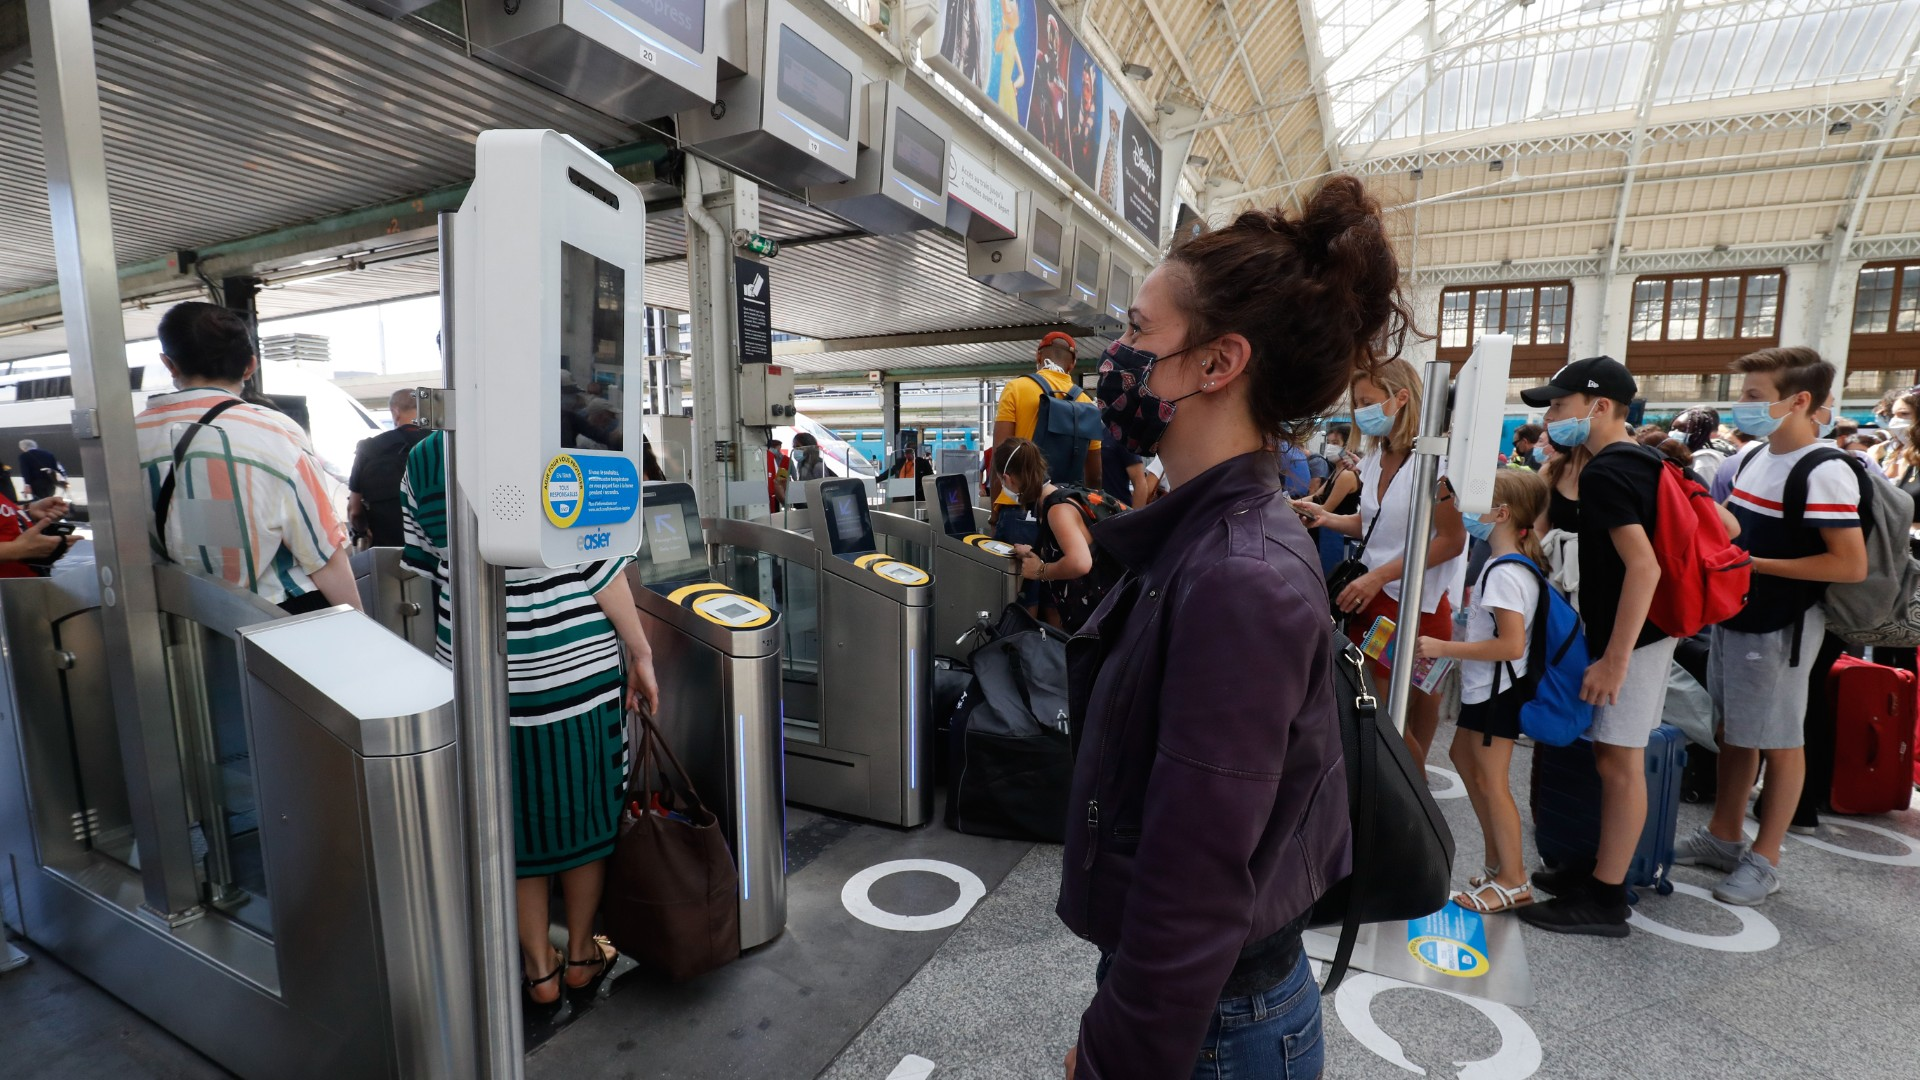 Summer Holiday Season Begins In France Despite Covid 19 Fears Cgtn